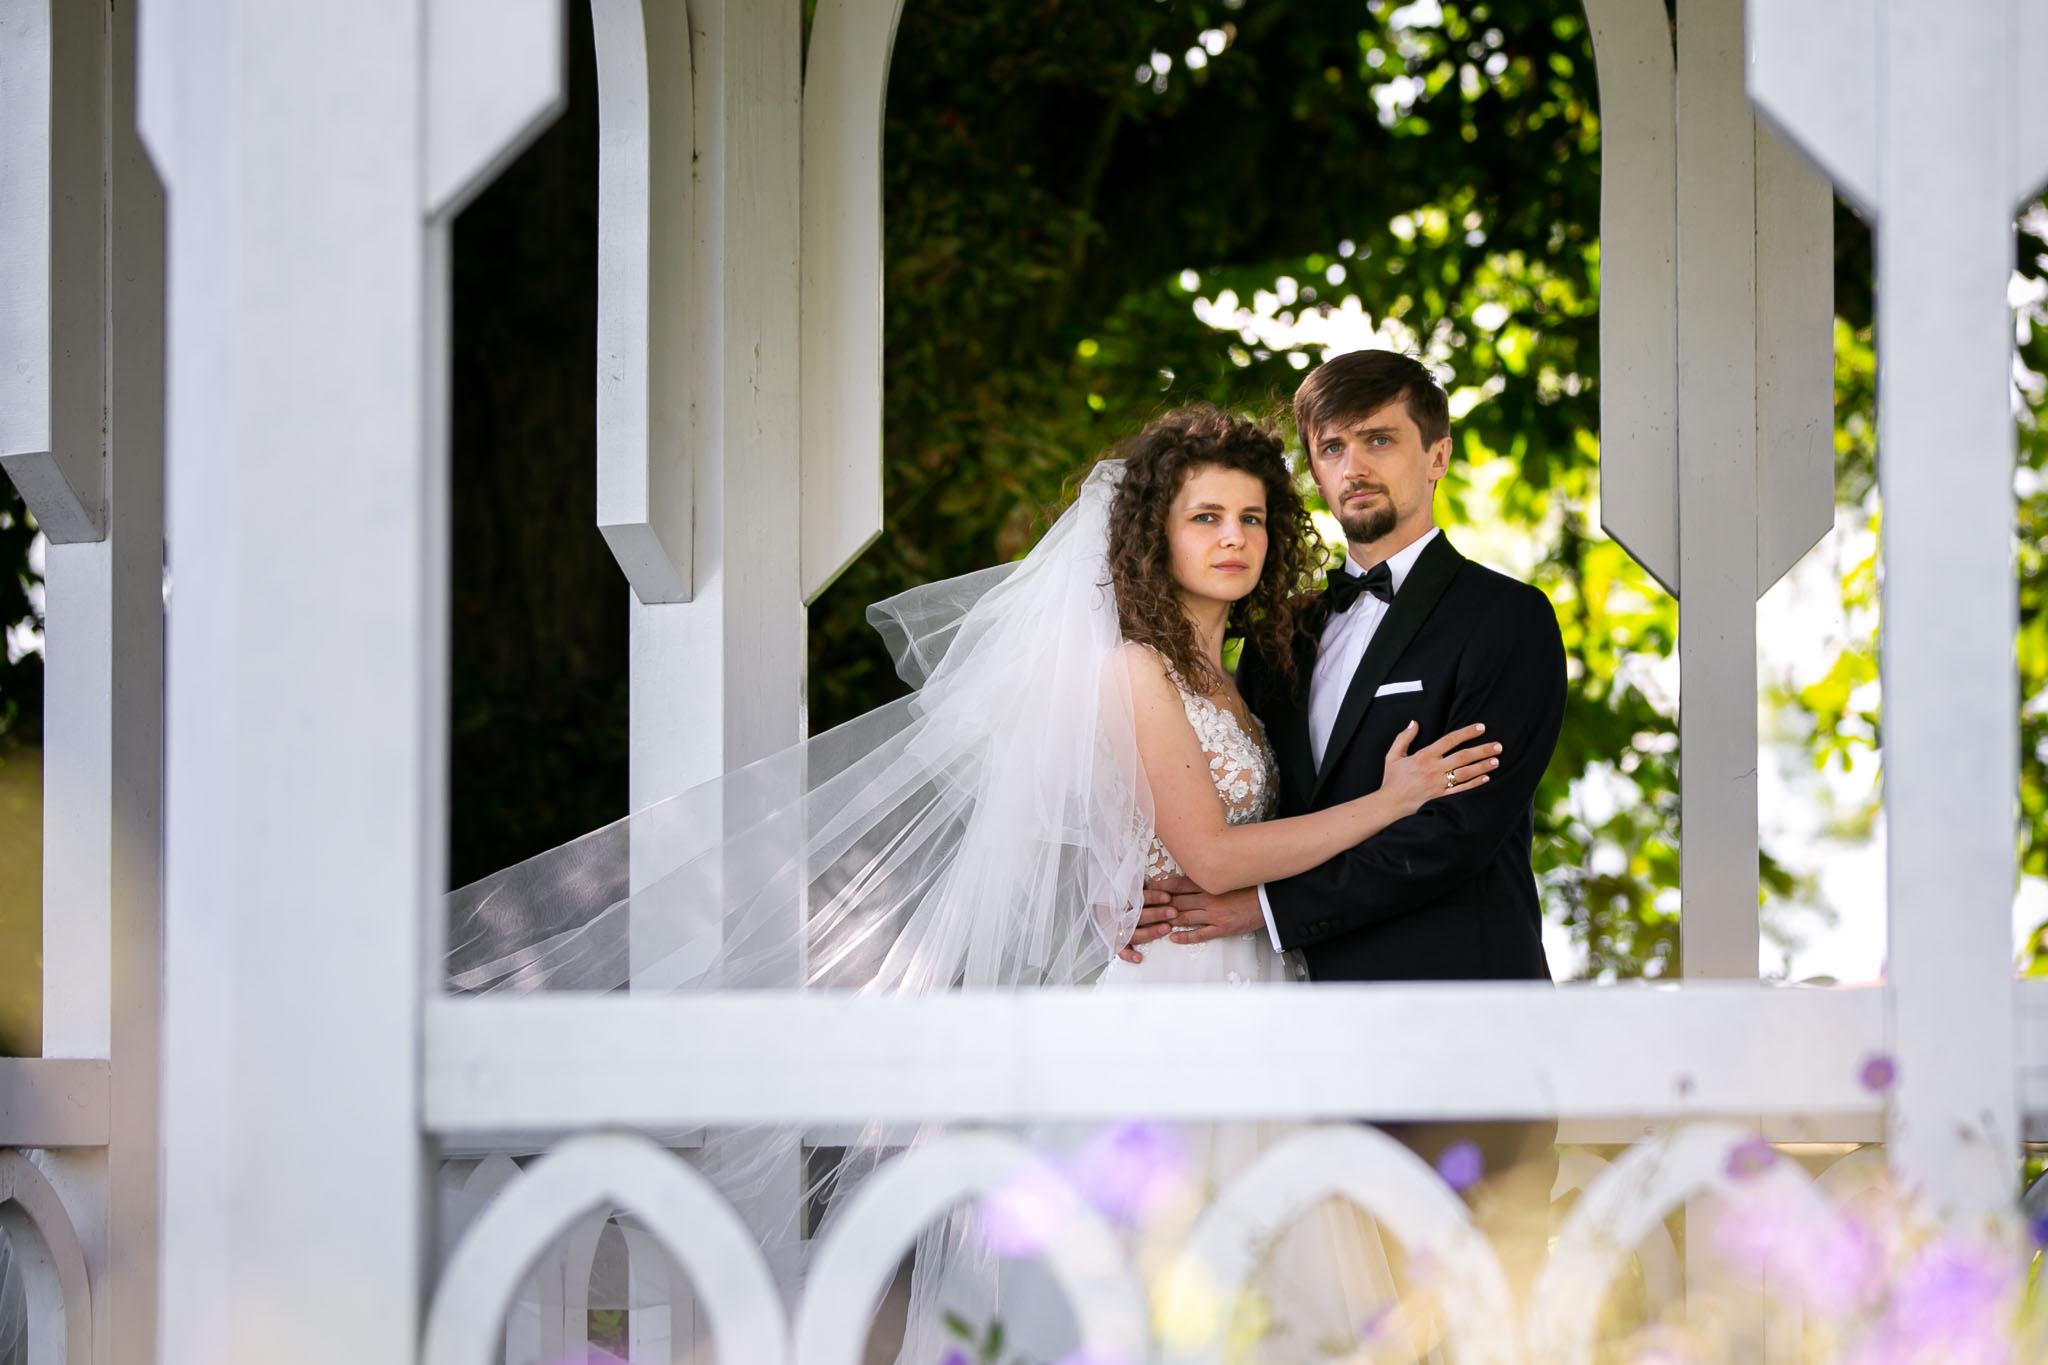 Marta i Daniel sesja slubna empiriafoto fotograf slubny